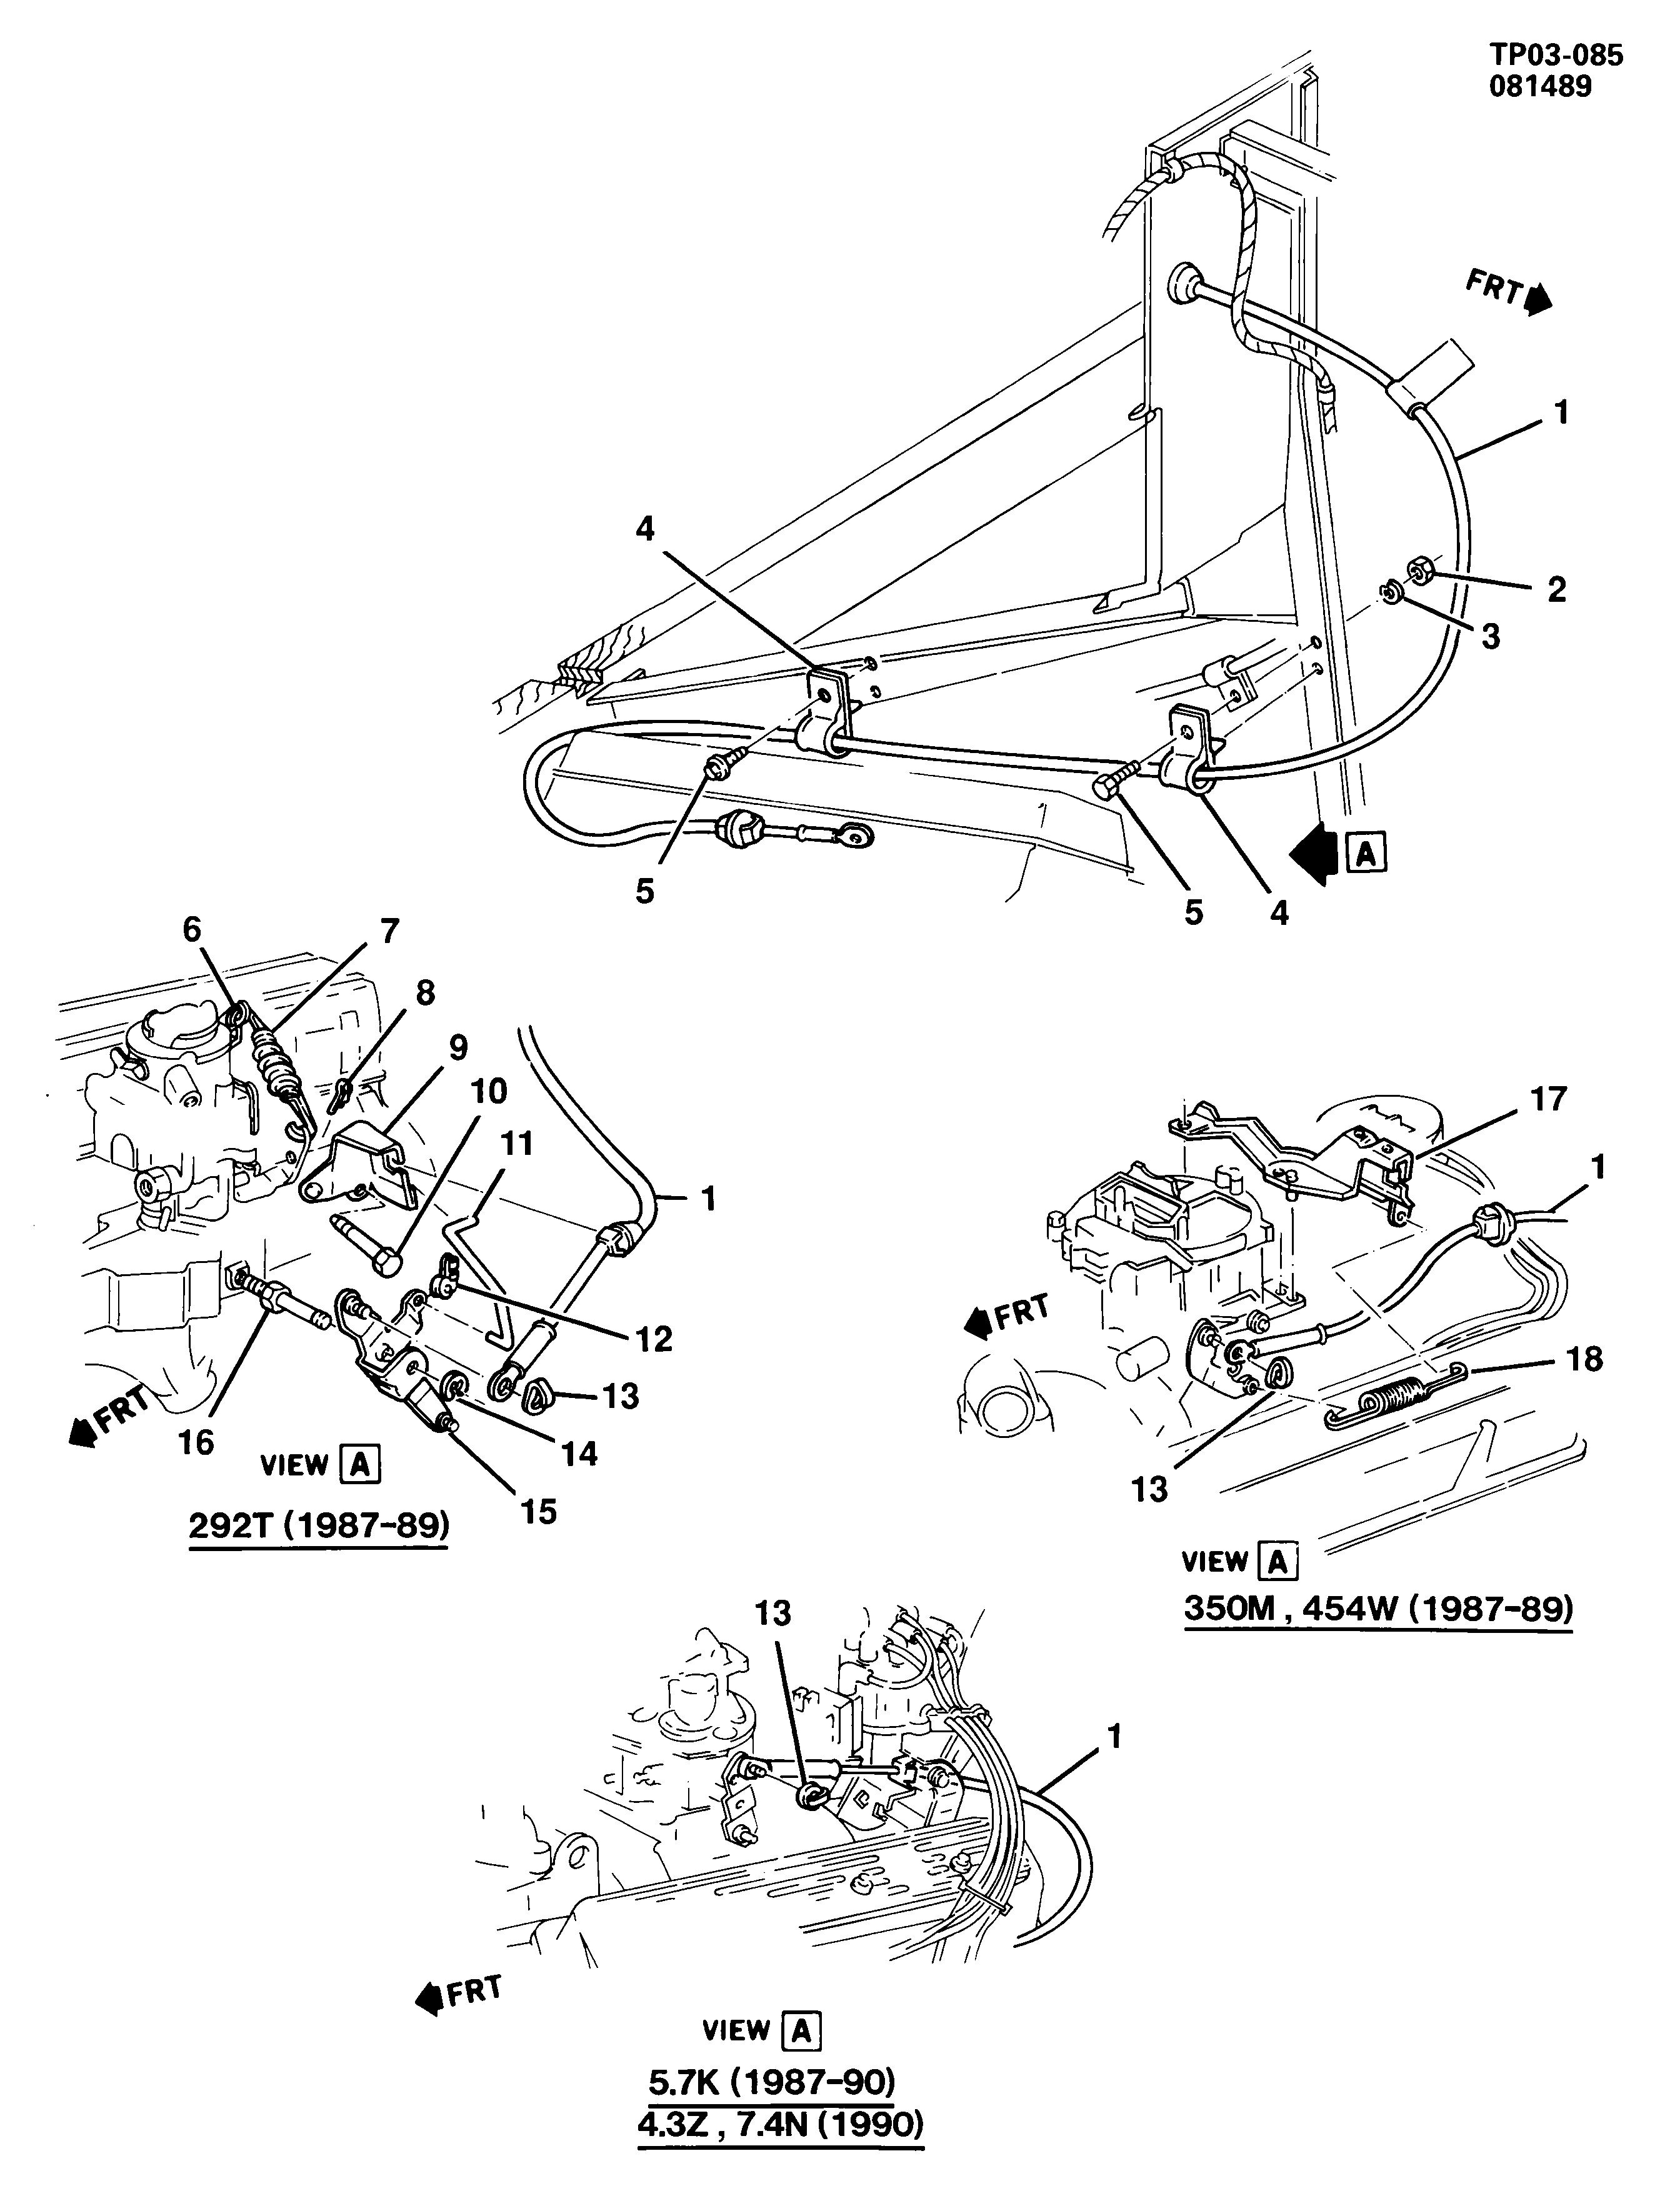 Gmc P25 P2500 Van P3 Accelerator Control Engine Compartment L25 Diagram Spare Parts Catalog Epc